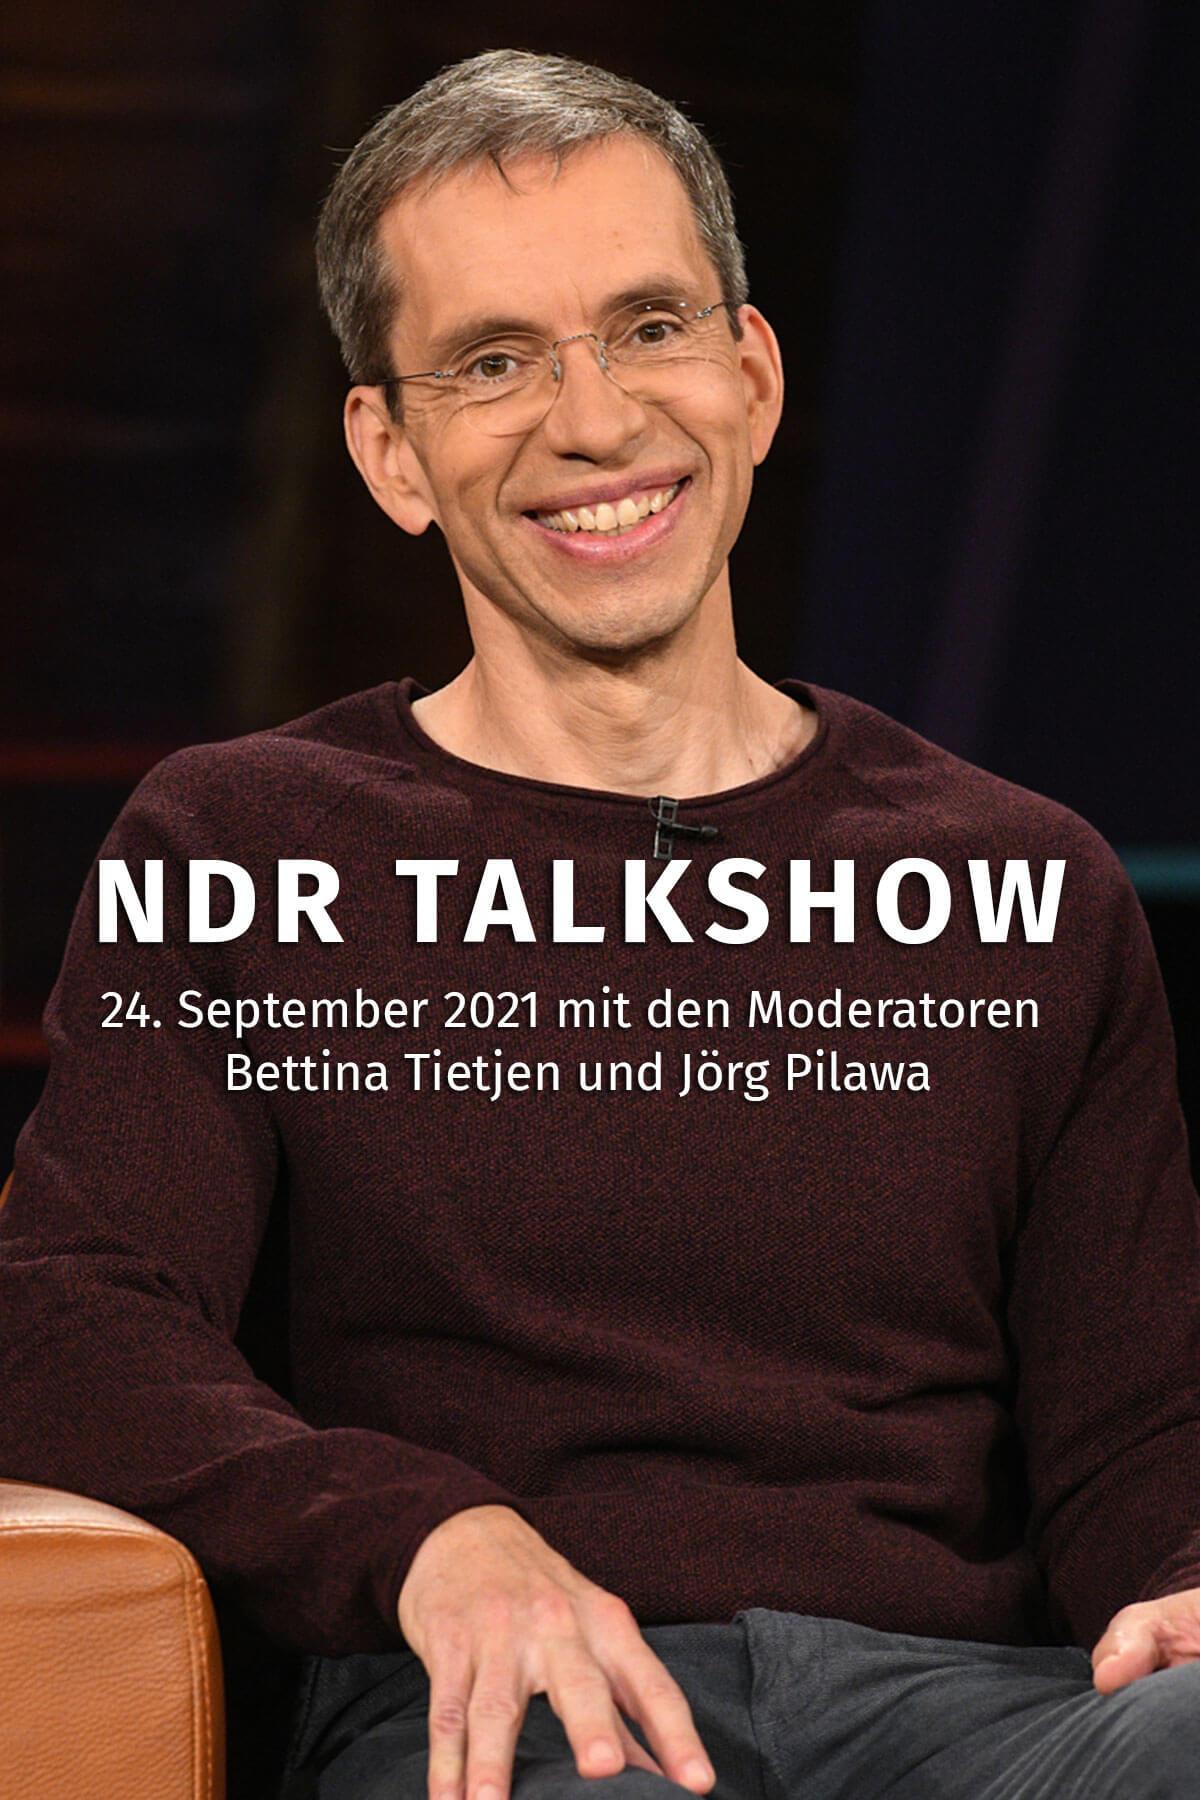 Jens-Söring_mobile_NDR-Talk-Show